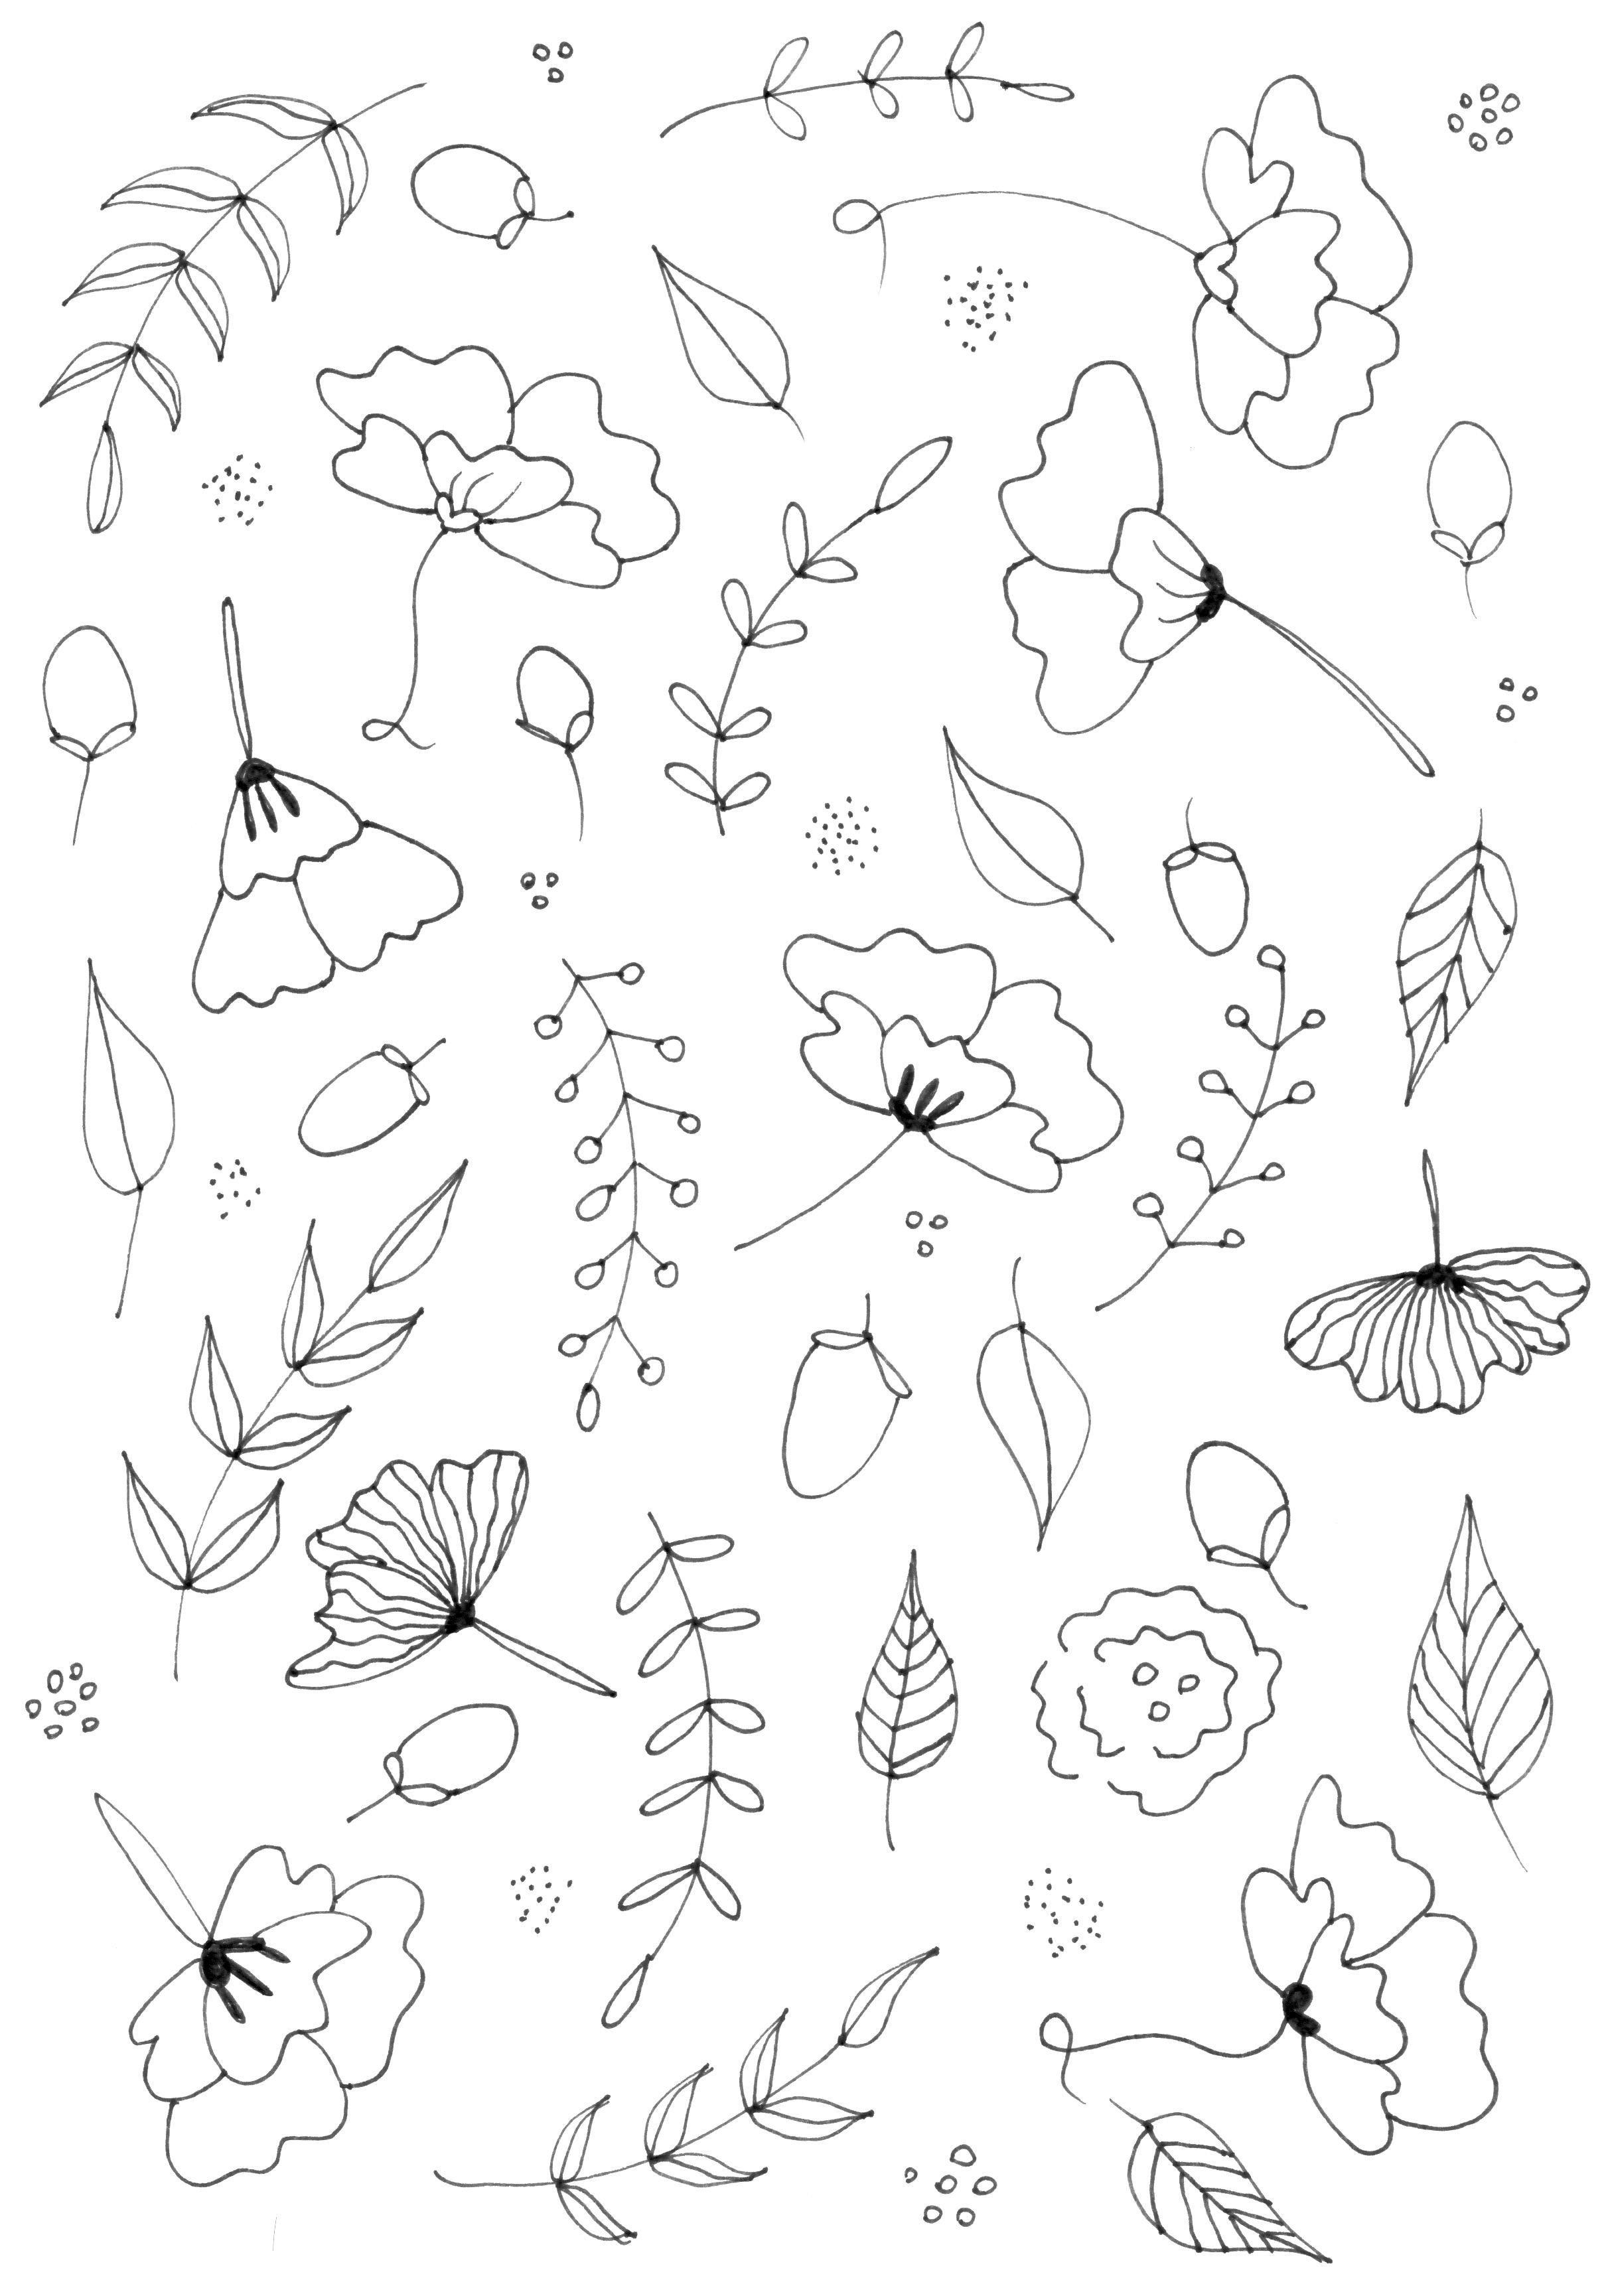 botanical line drawing practice and pattern skillshare